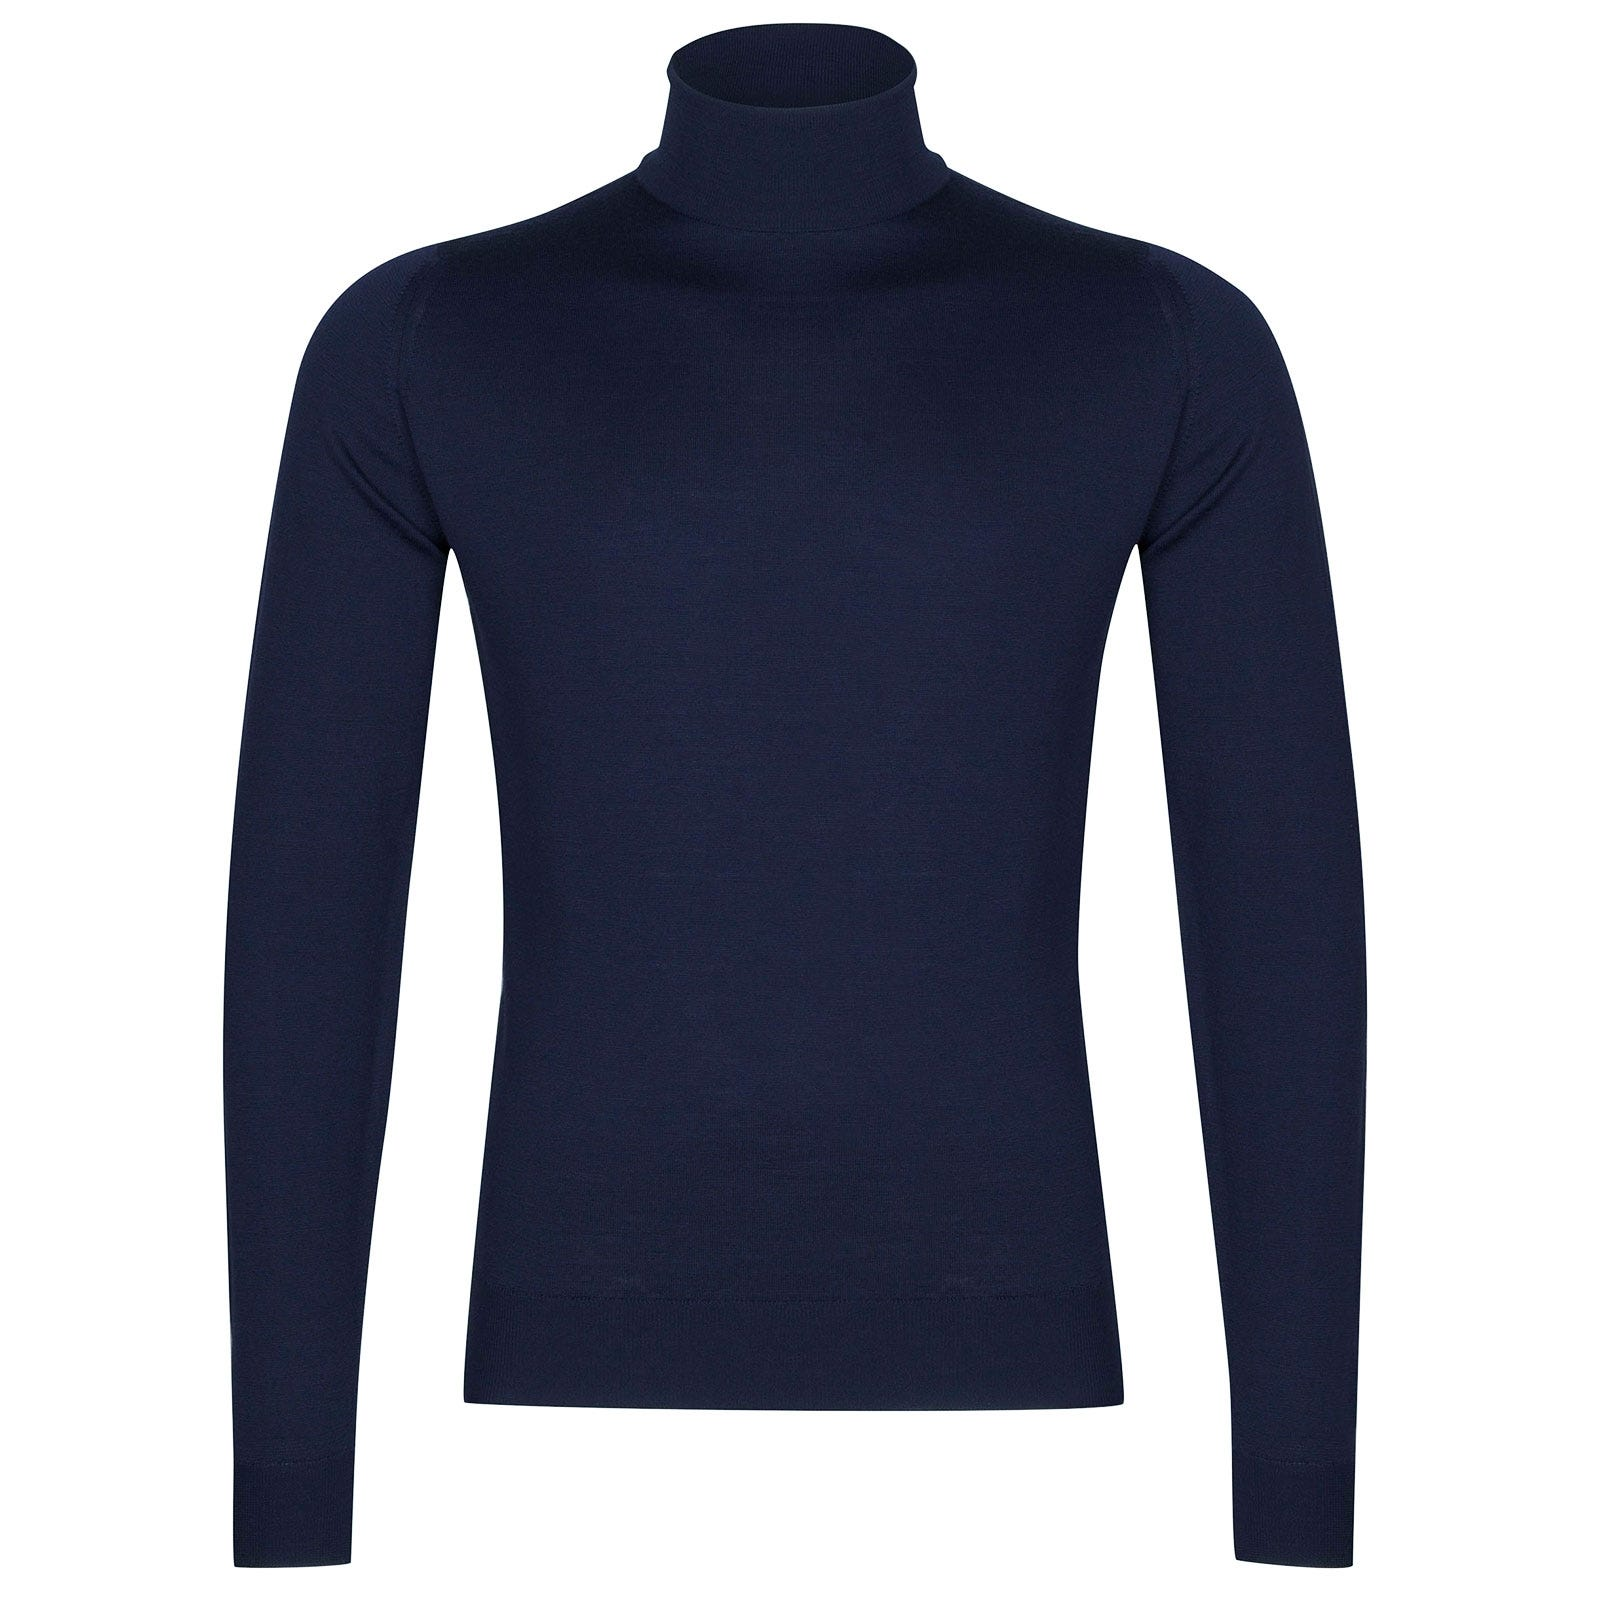 John Smedley Cherwell Merino Wool Pullover in Magnetic Cobalt-M